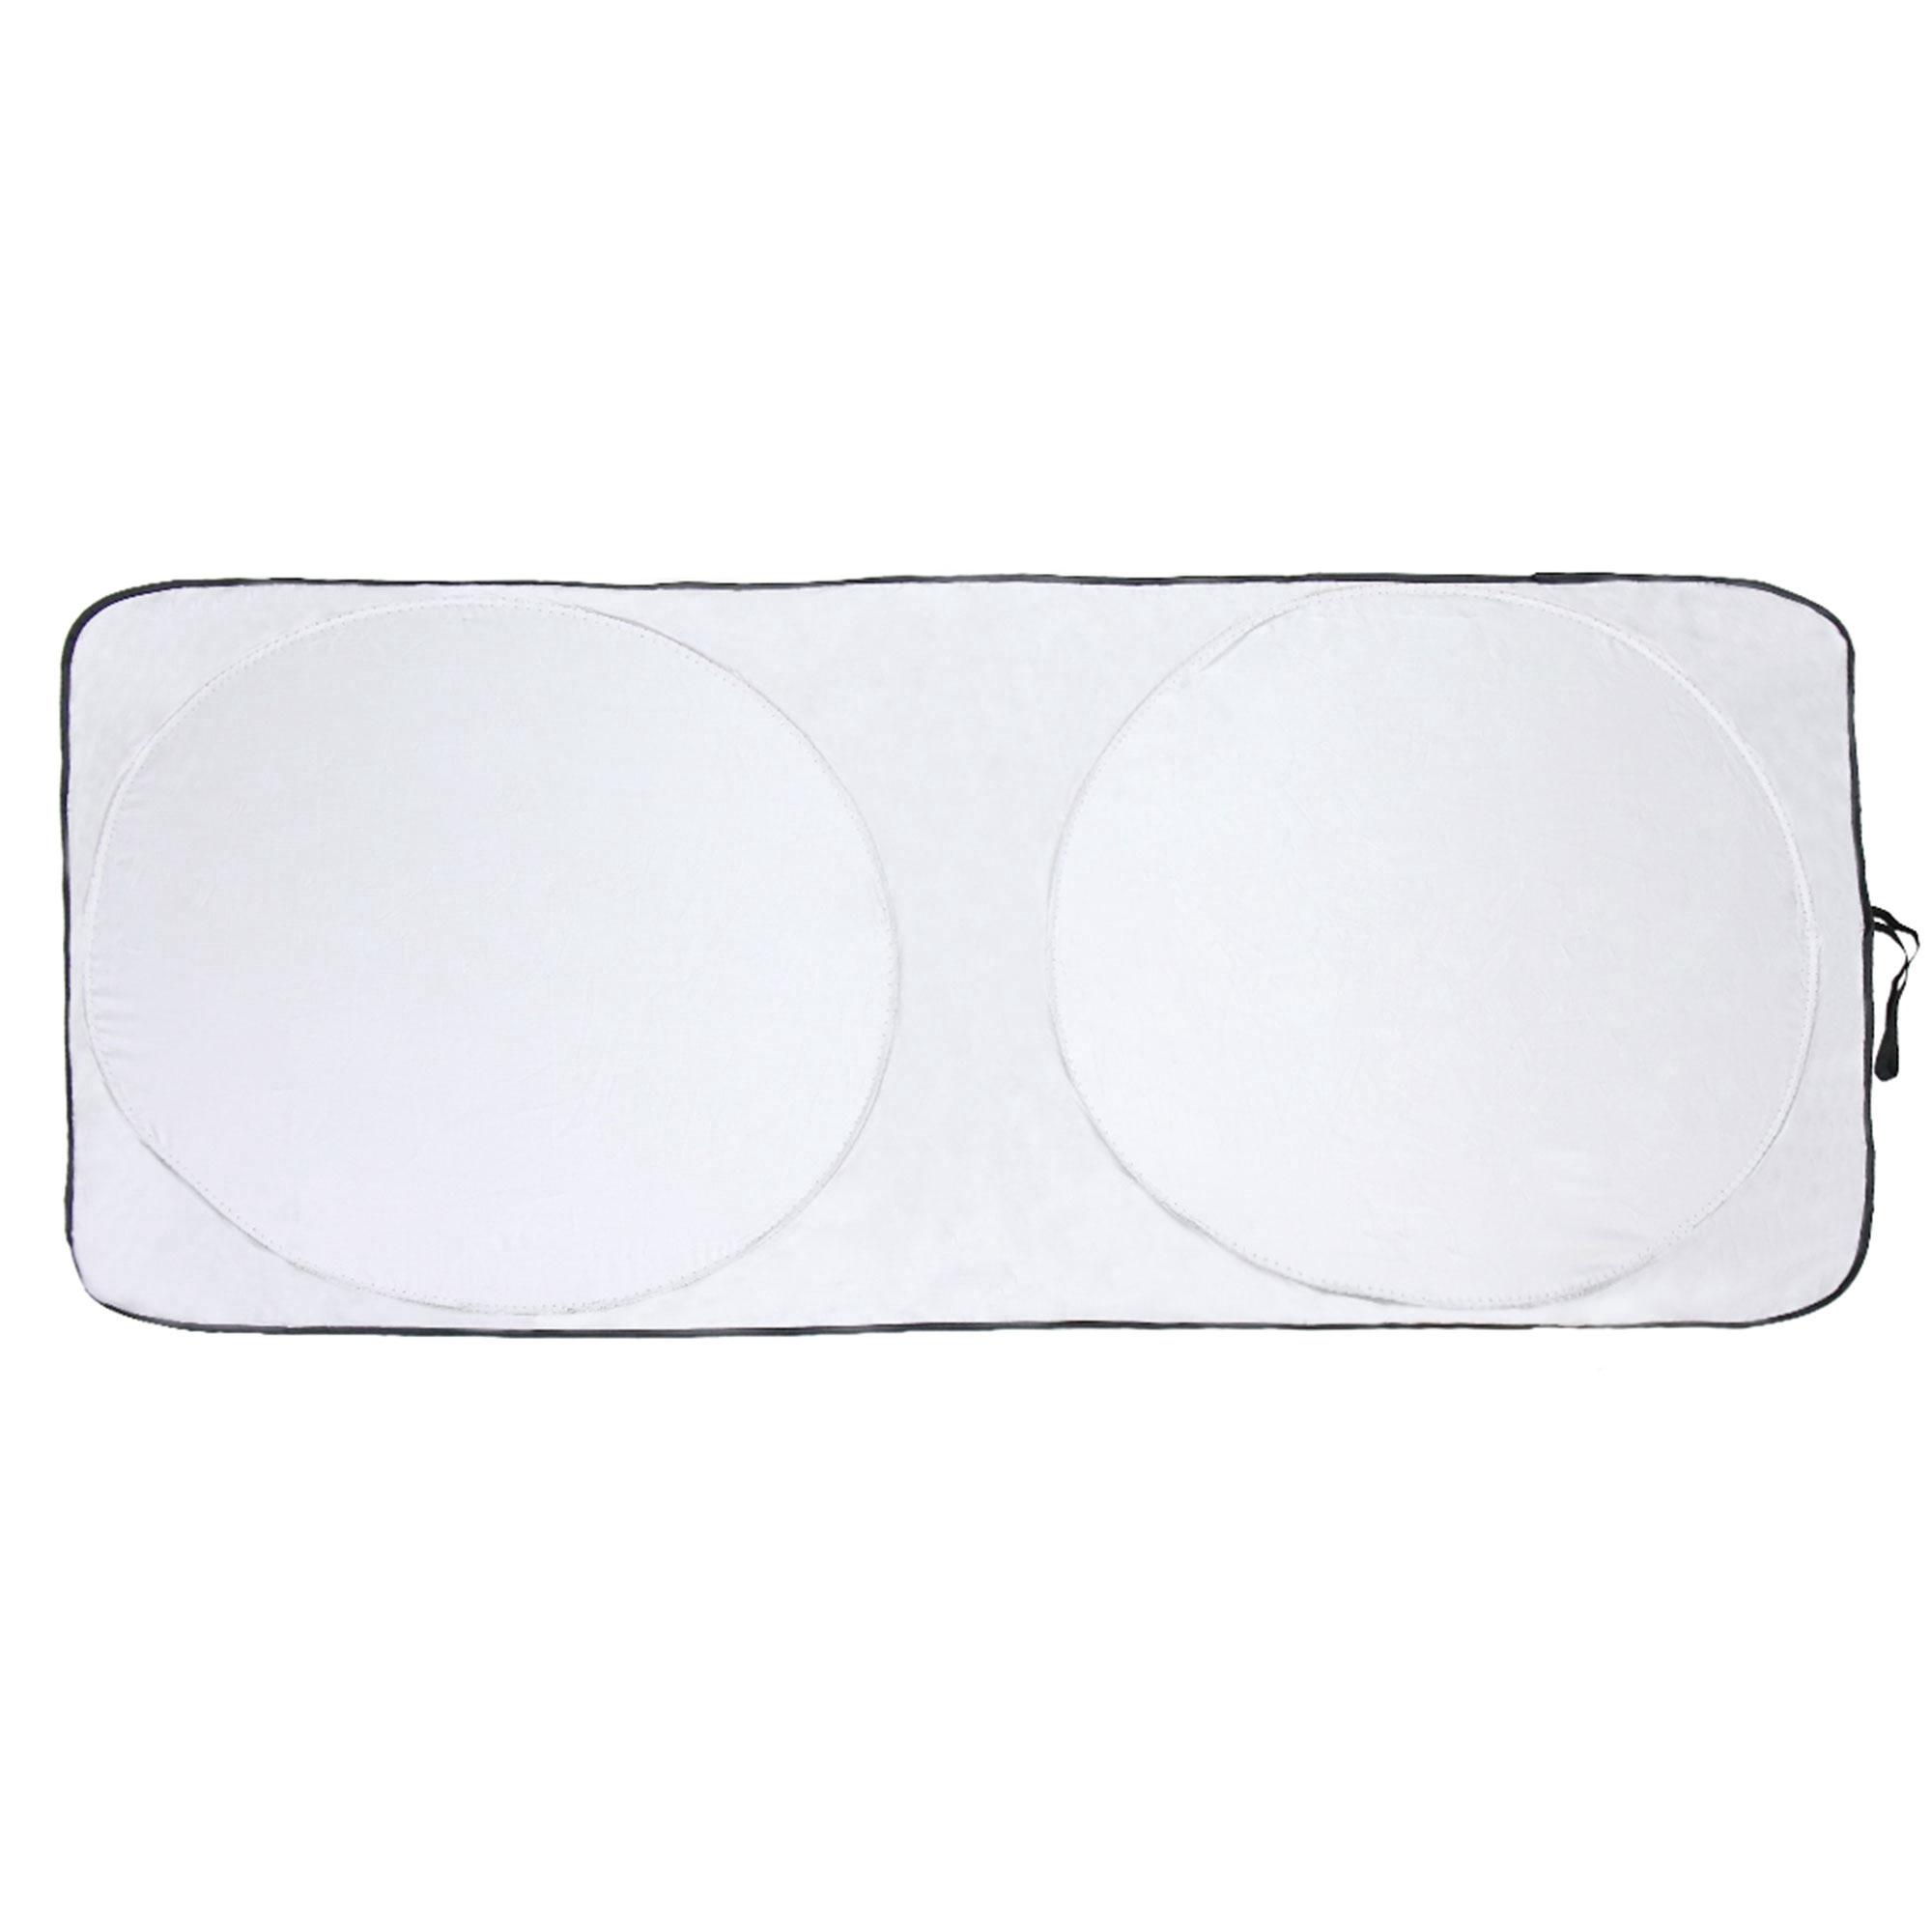 Foldable Silvering Reflective Car Windshield Sun Shade Visor for UV Rays Block